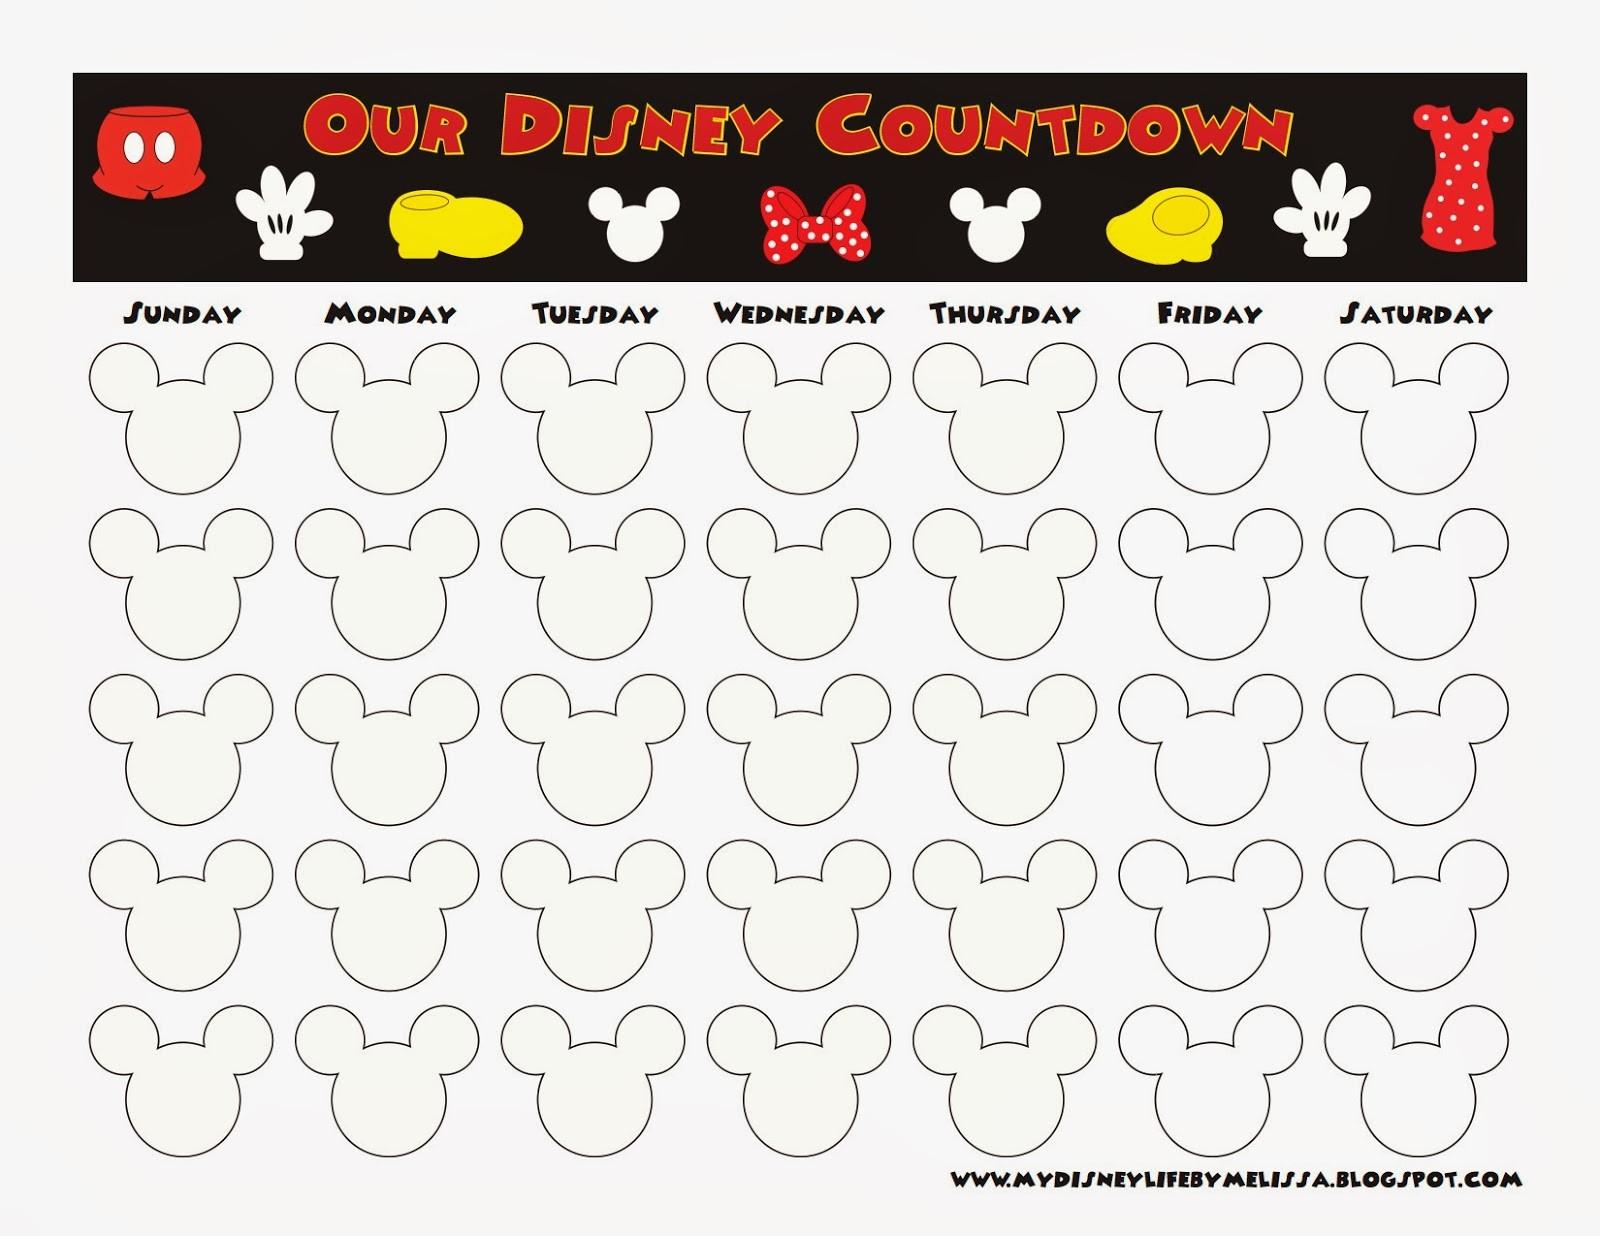 Countdown Calendars Printable